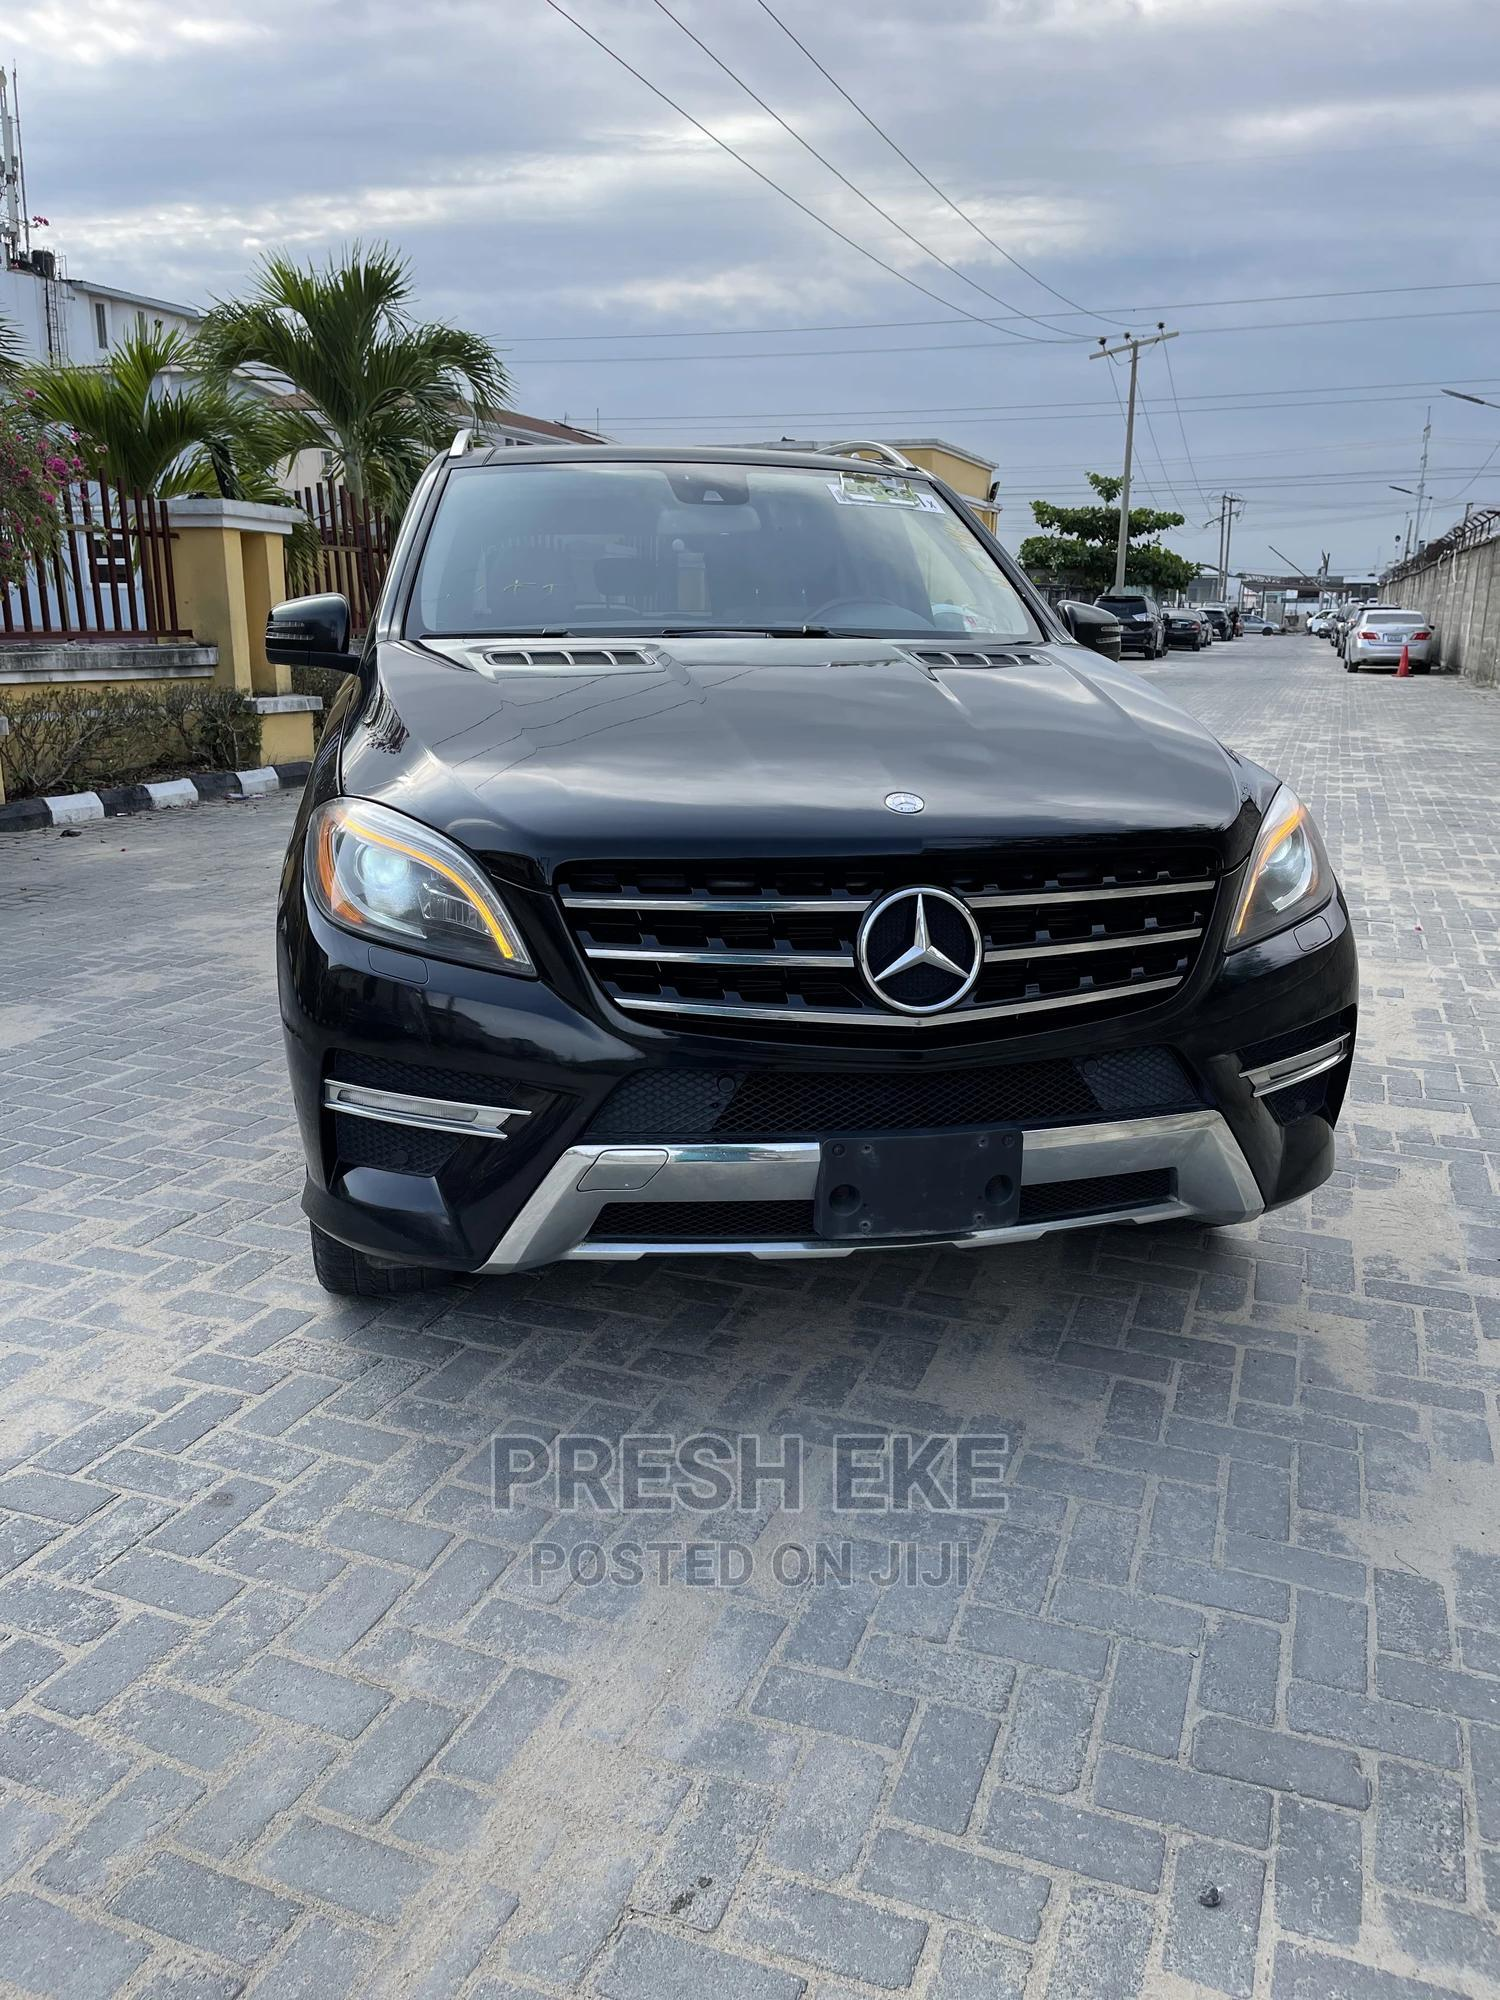 Archive: Mercedes-Benz M Class 2012 ML 550 4Matic Black